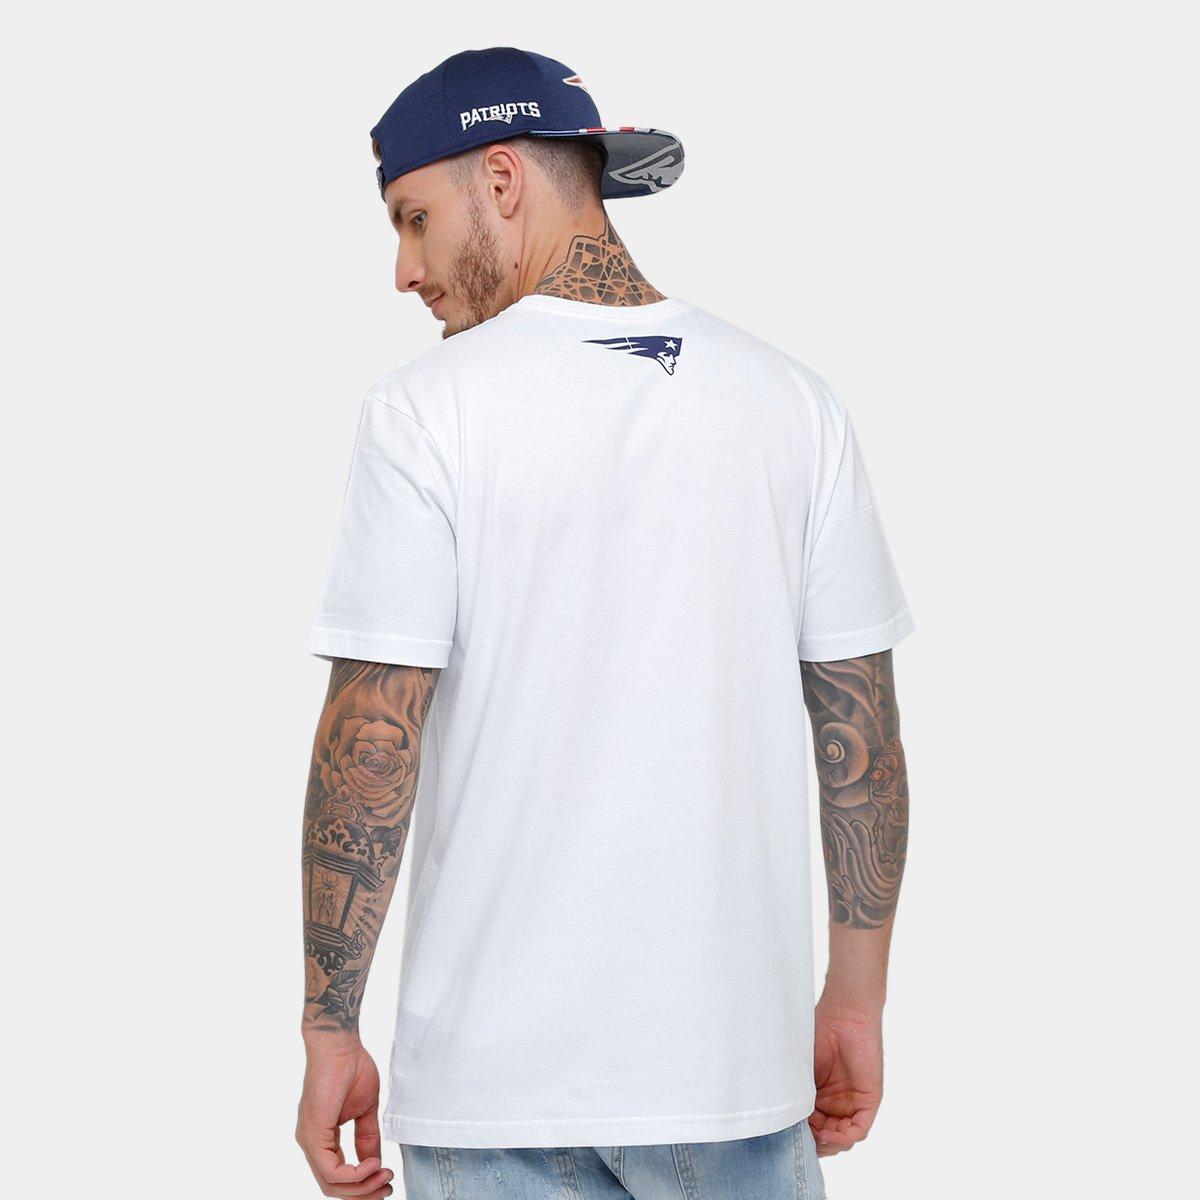 ... Camiseta New Era NFL New England Patriots Jogadores Masculina ... 0583c4efe6f6e